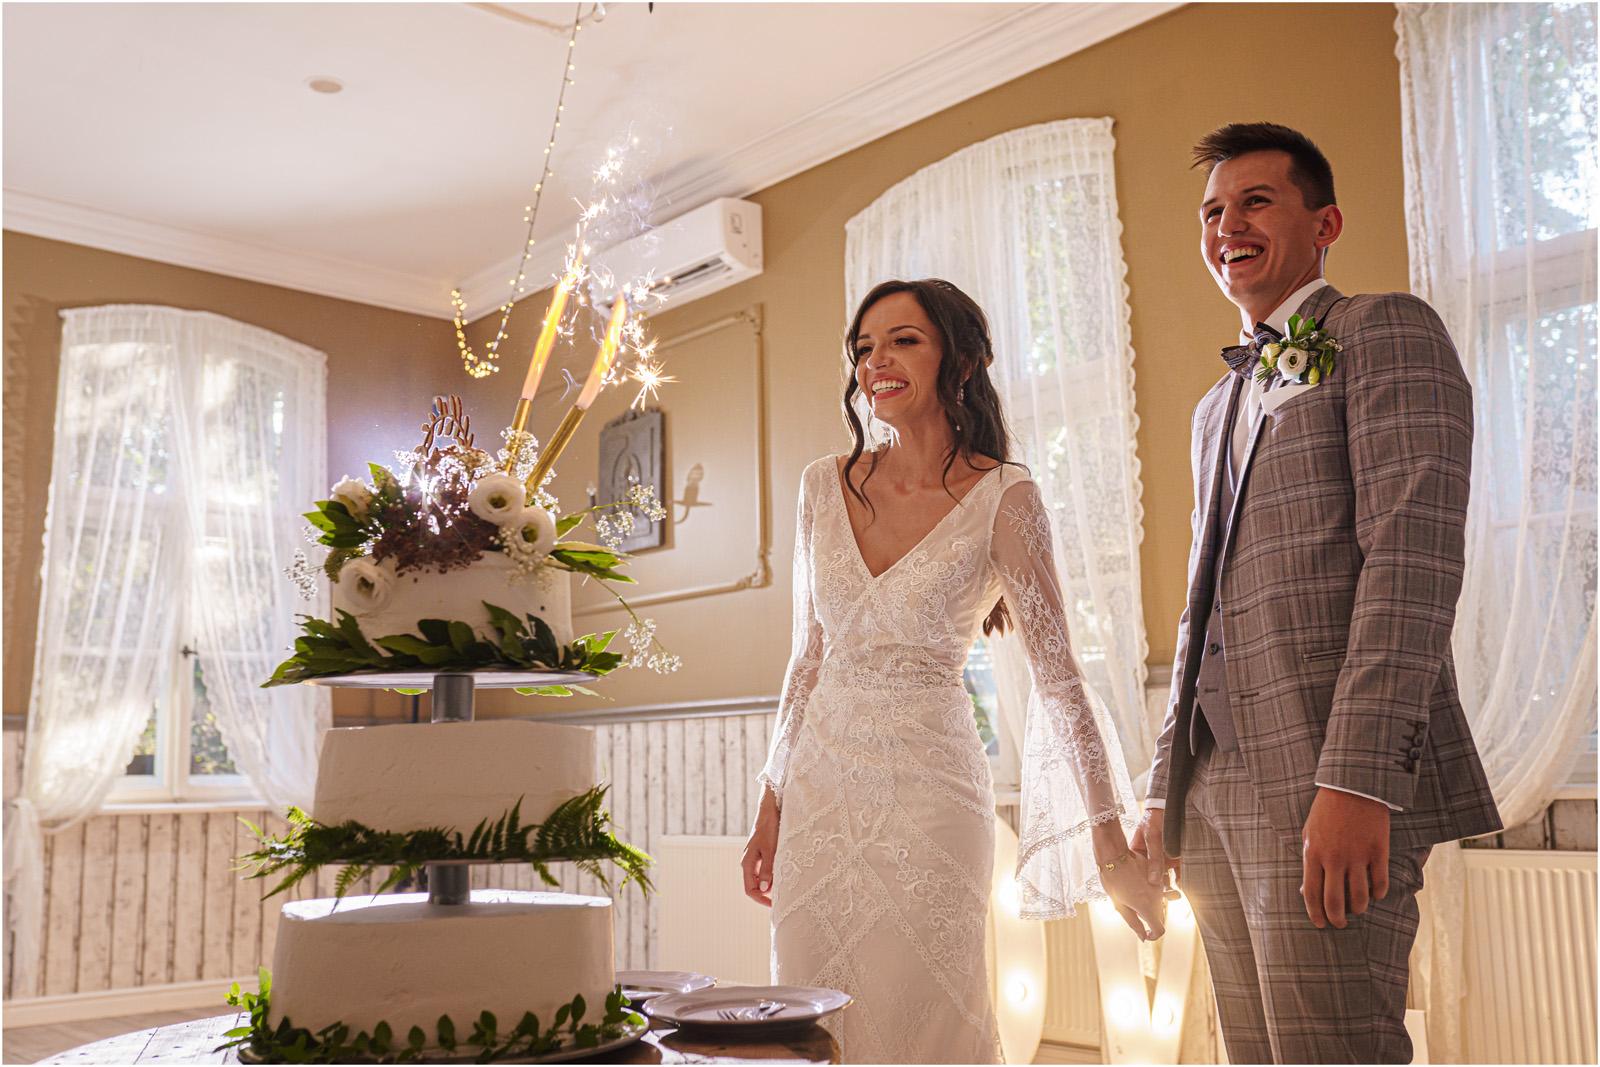 Ania & Mateusz | boho wesele w Stodole pod Kasztanami 87